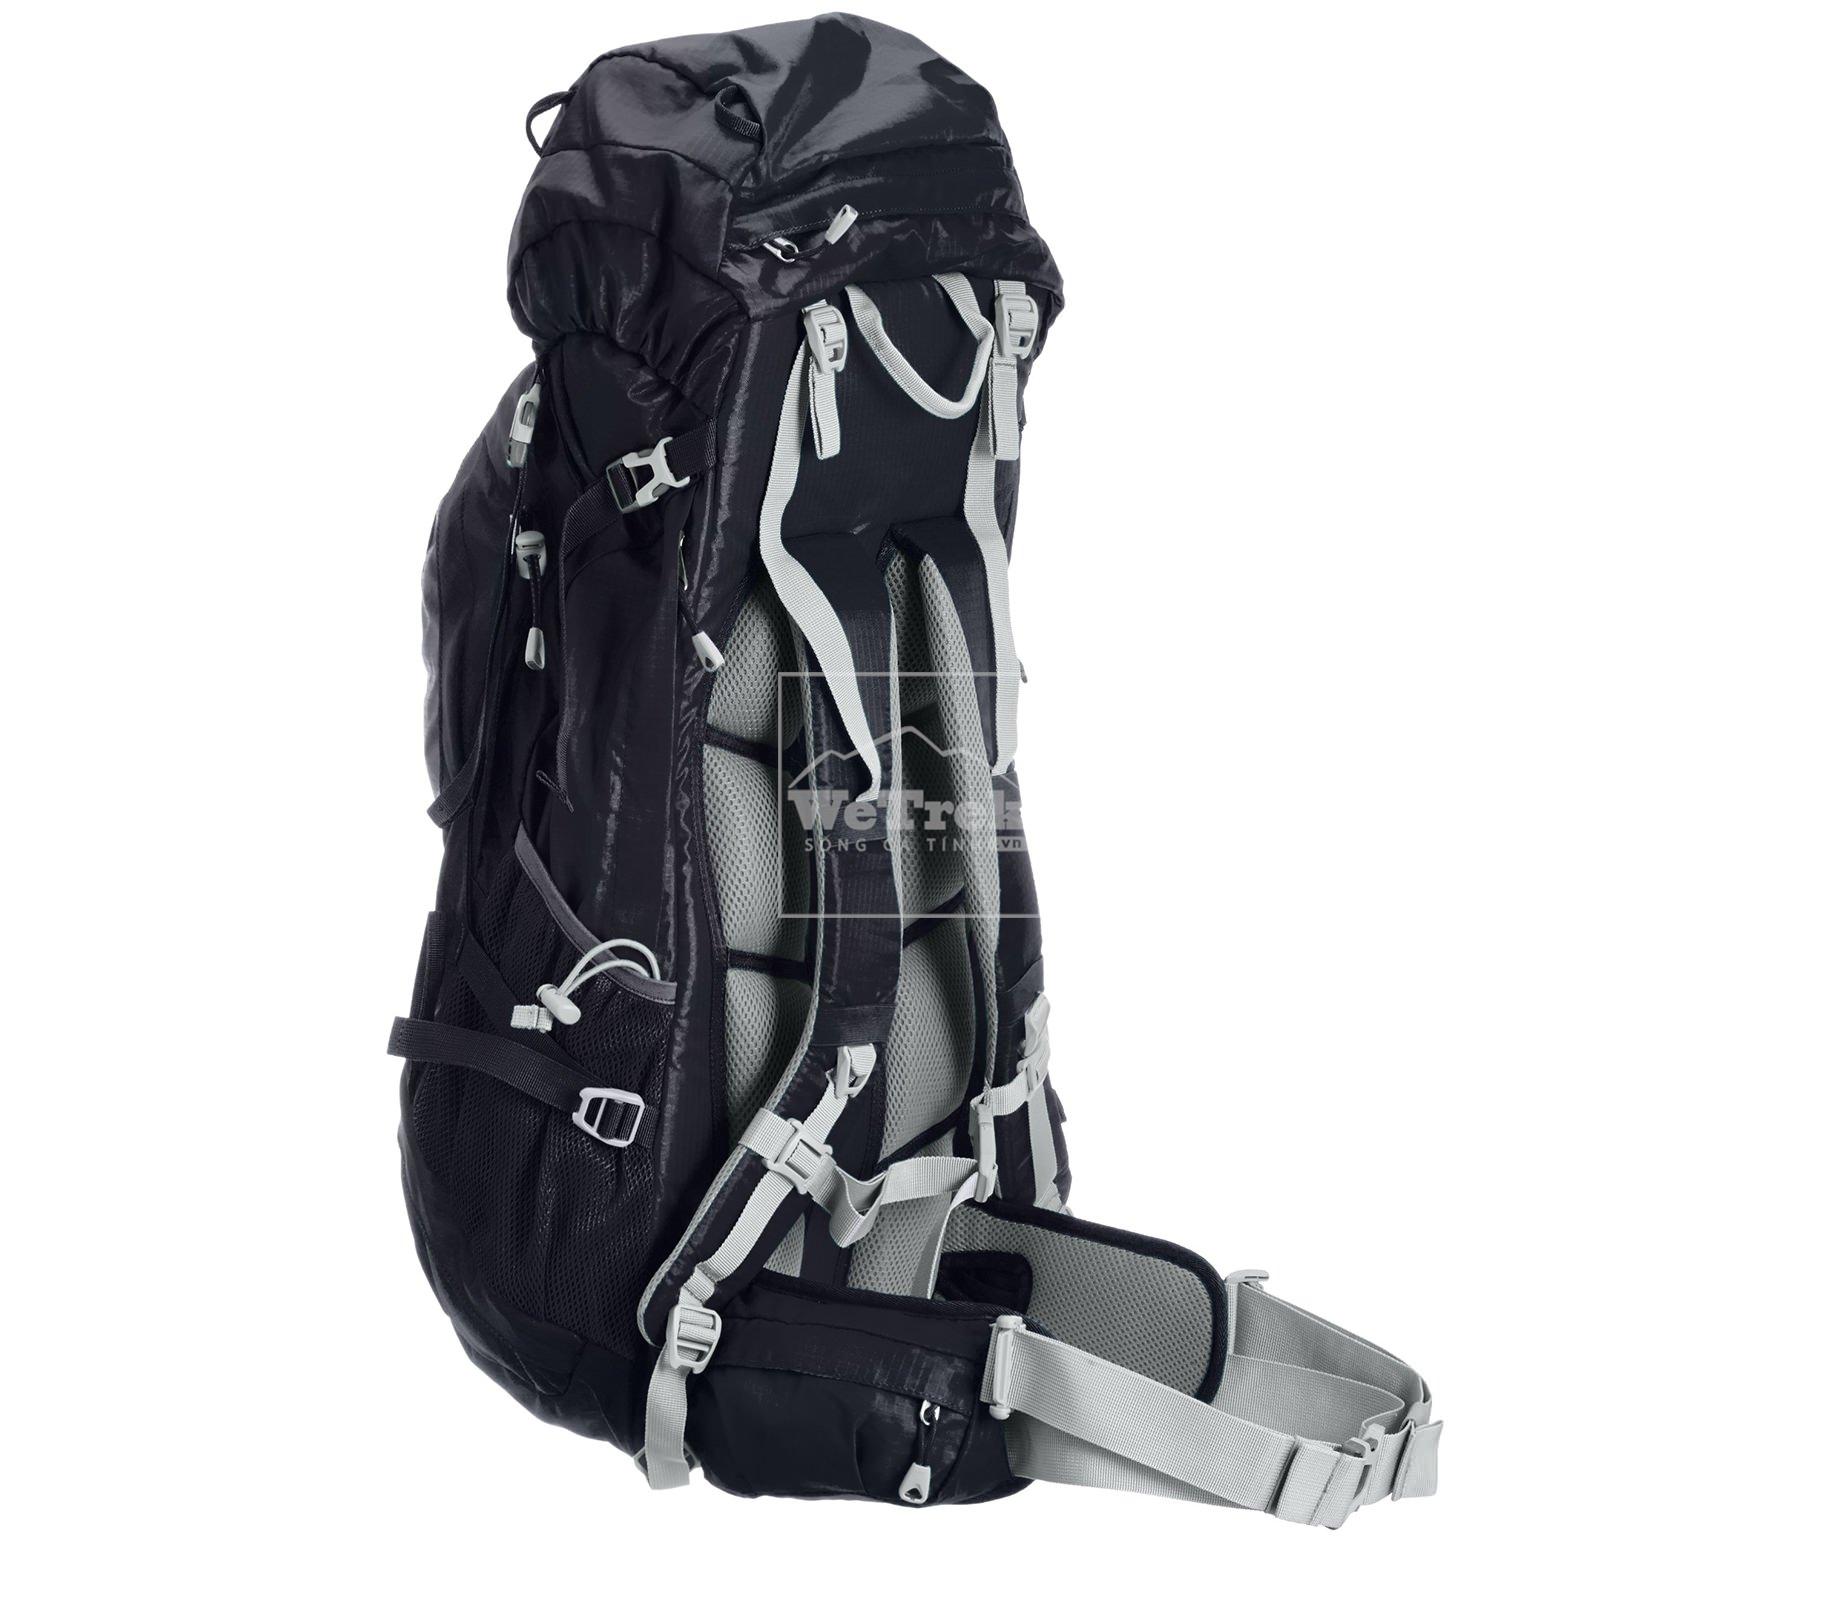 ba-lo-leo-nui-50l-coleman-mttrek-lite-backpack-black-cbb3491bk-7454-wetrek.vn-1